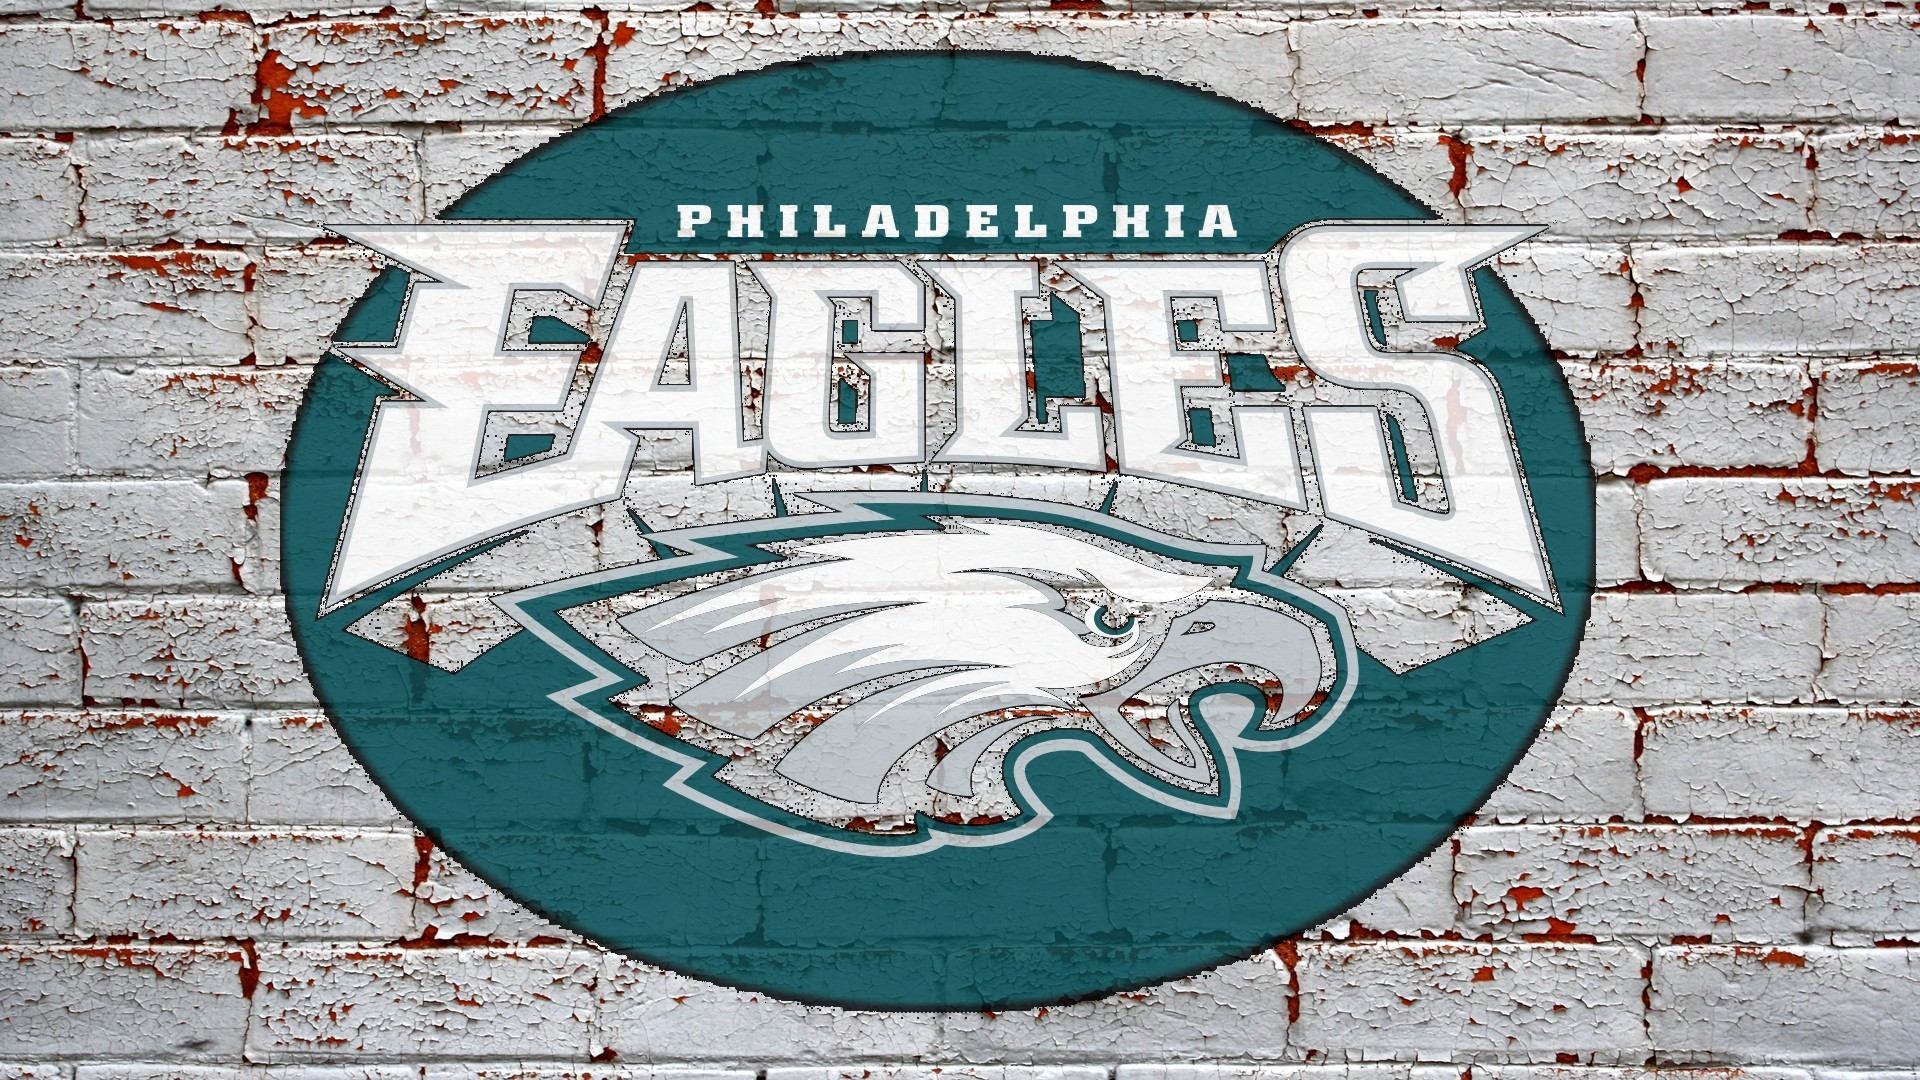 eagles, wallpaper, philadelphia, logo, philadephia